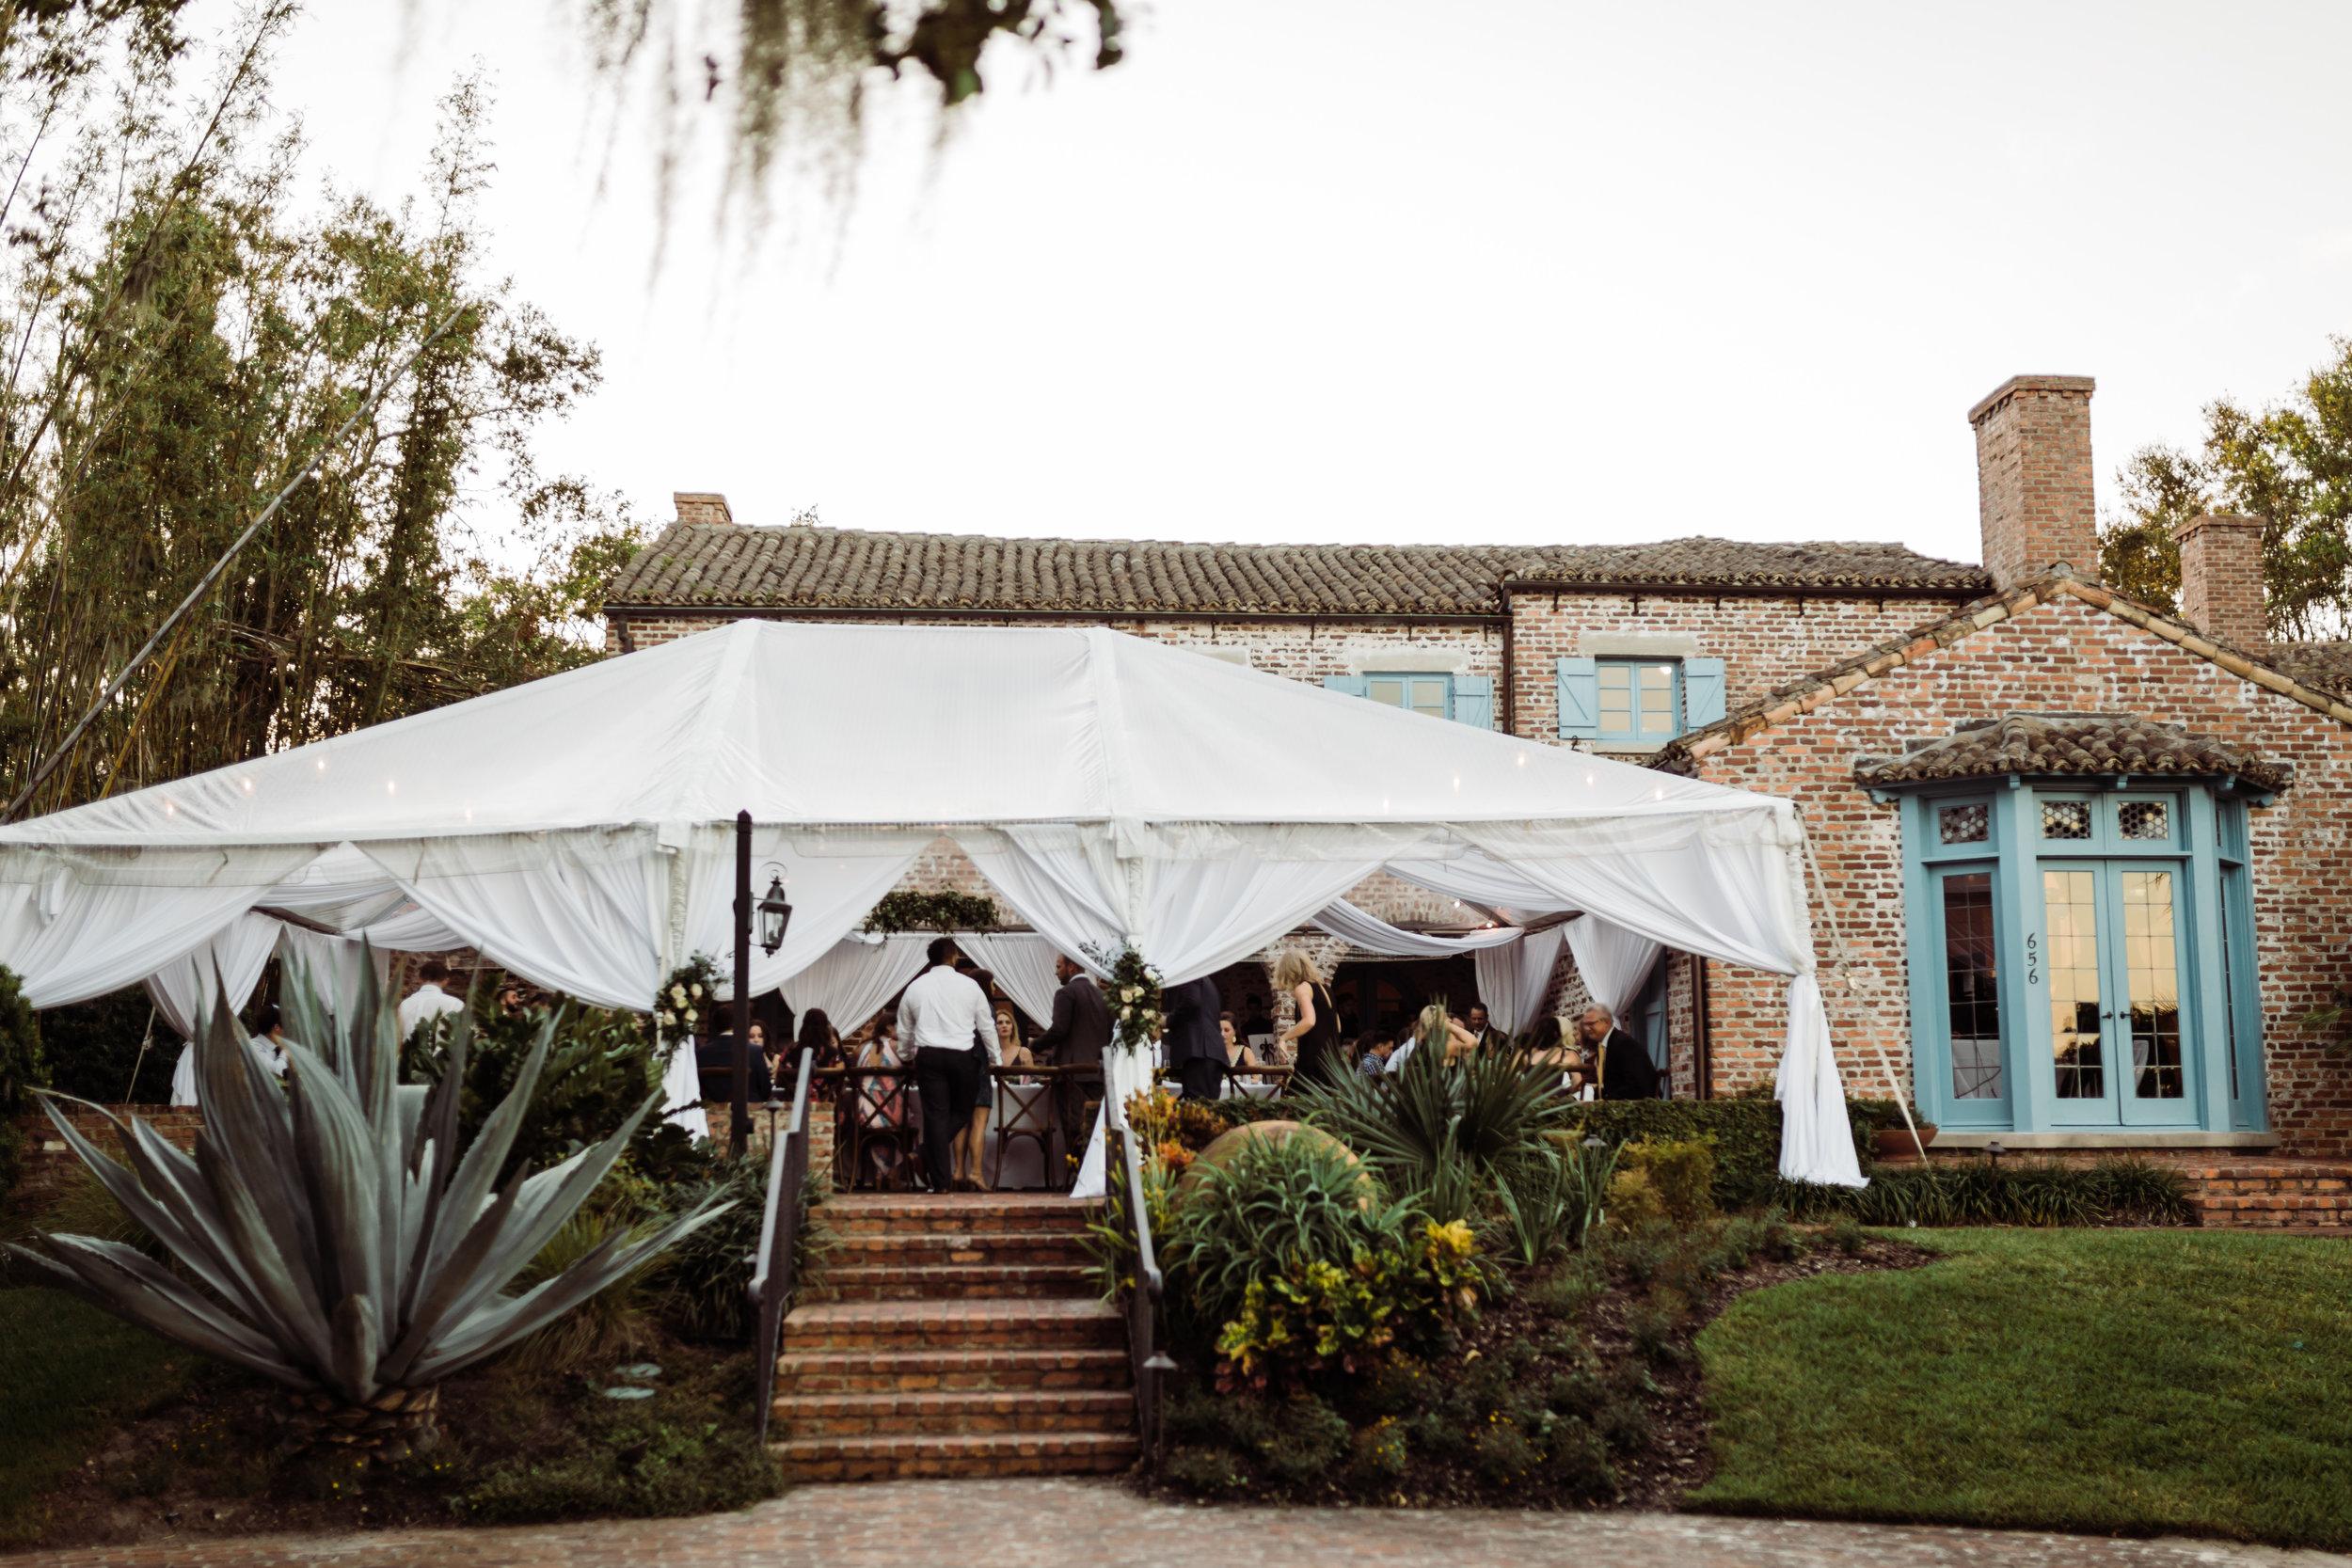 2017.10.15 Steffi and Elliott Simmonds Casa Feliz Wedding (696 of 969).jpg